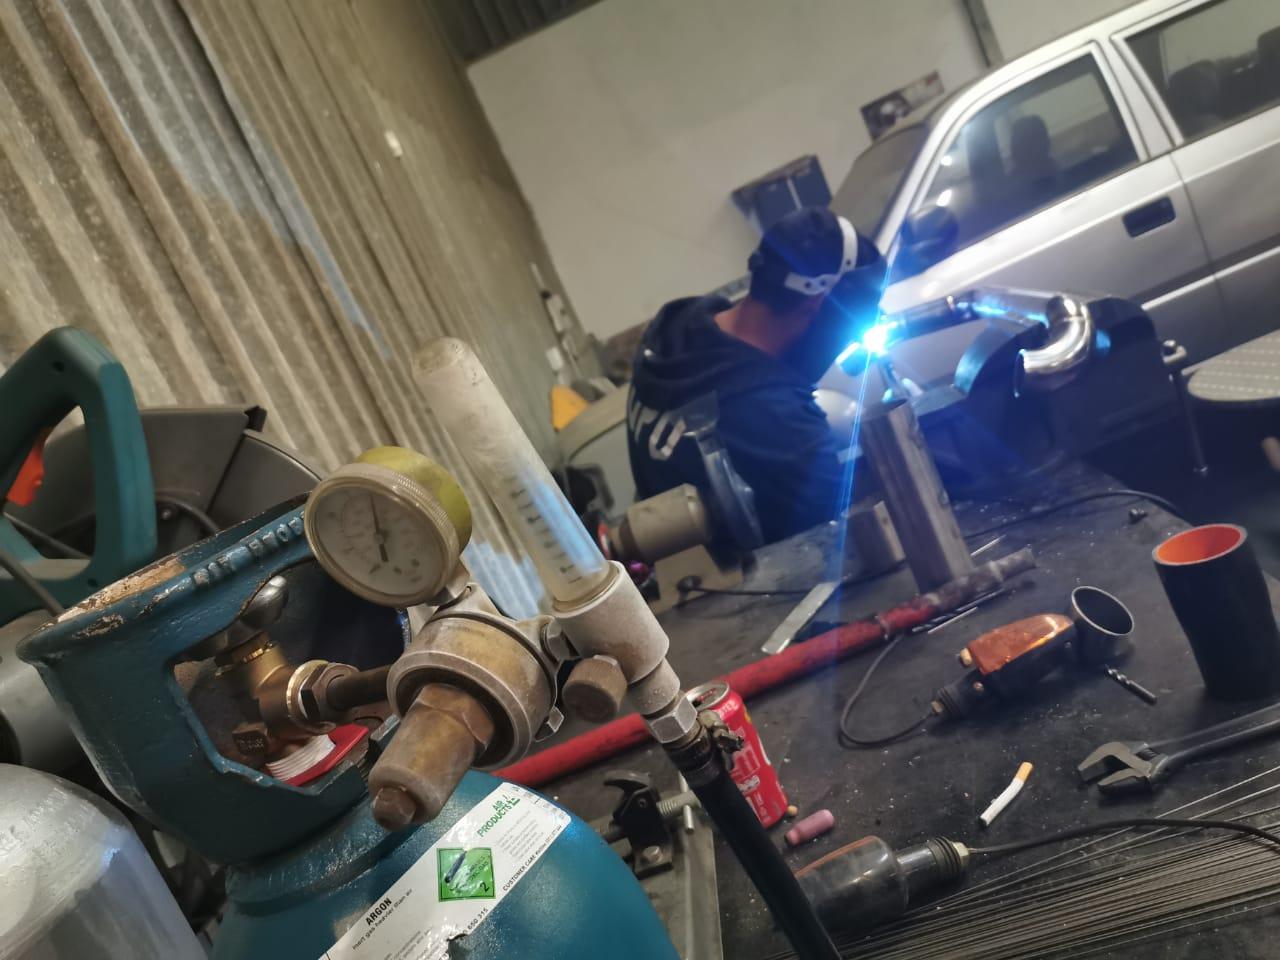 Stainless steel custom pipes